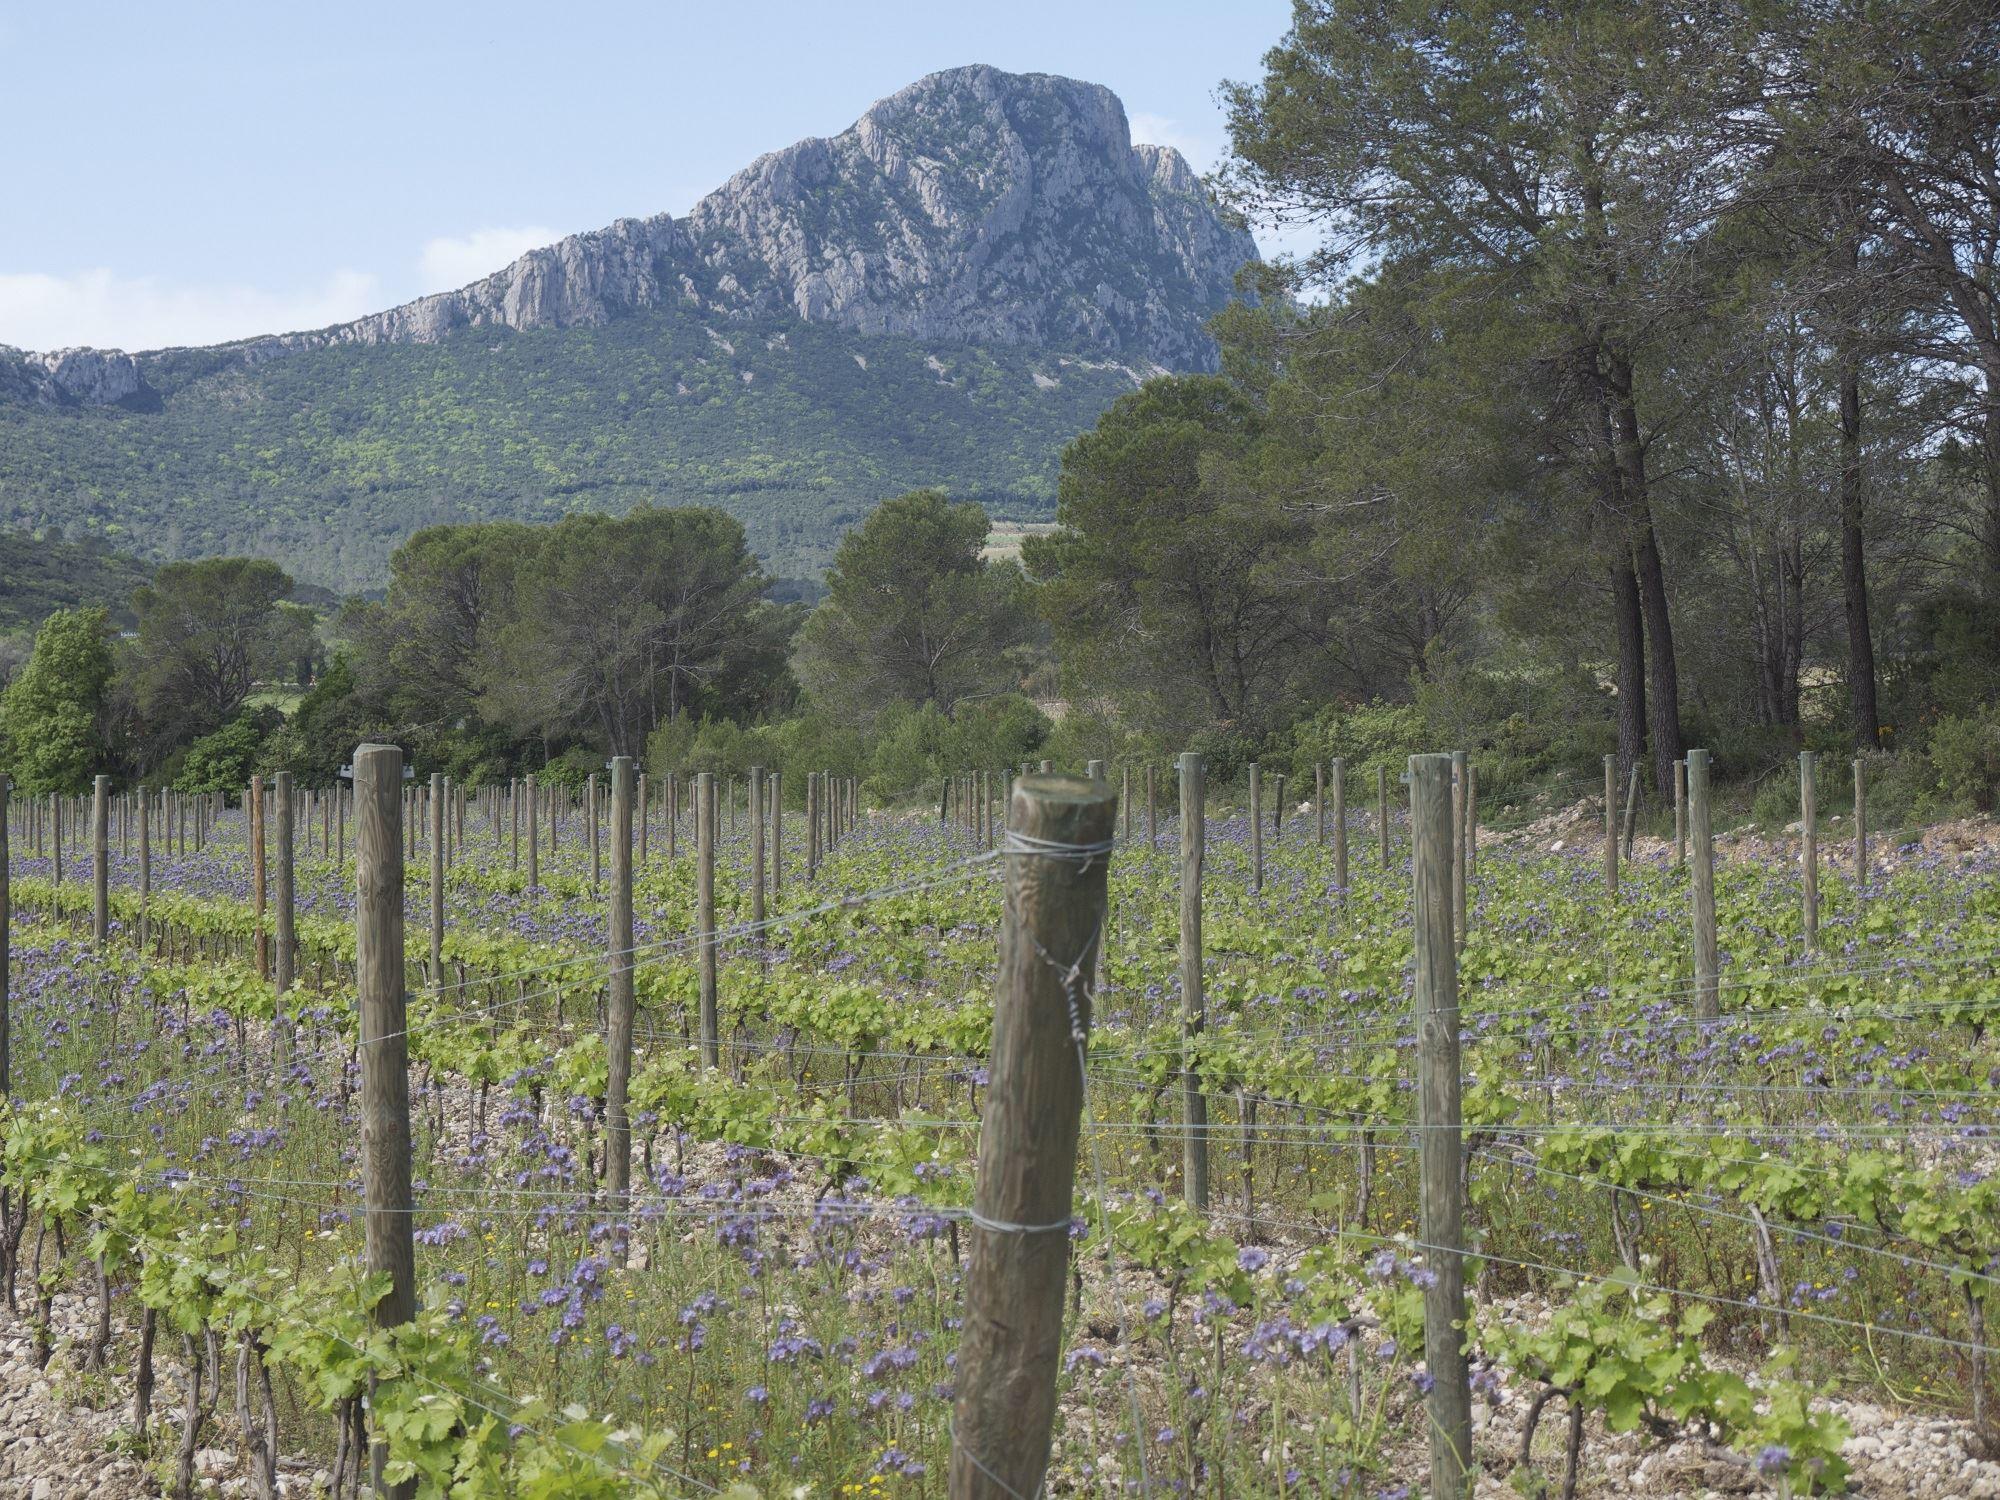 A Pic Saint Loup wine experience - Instant Terroir